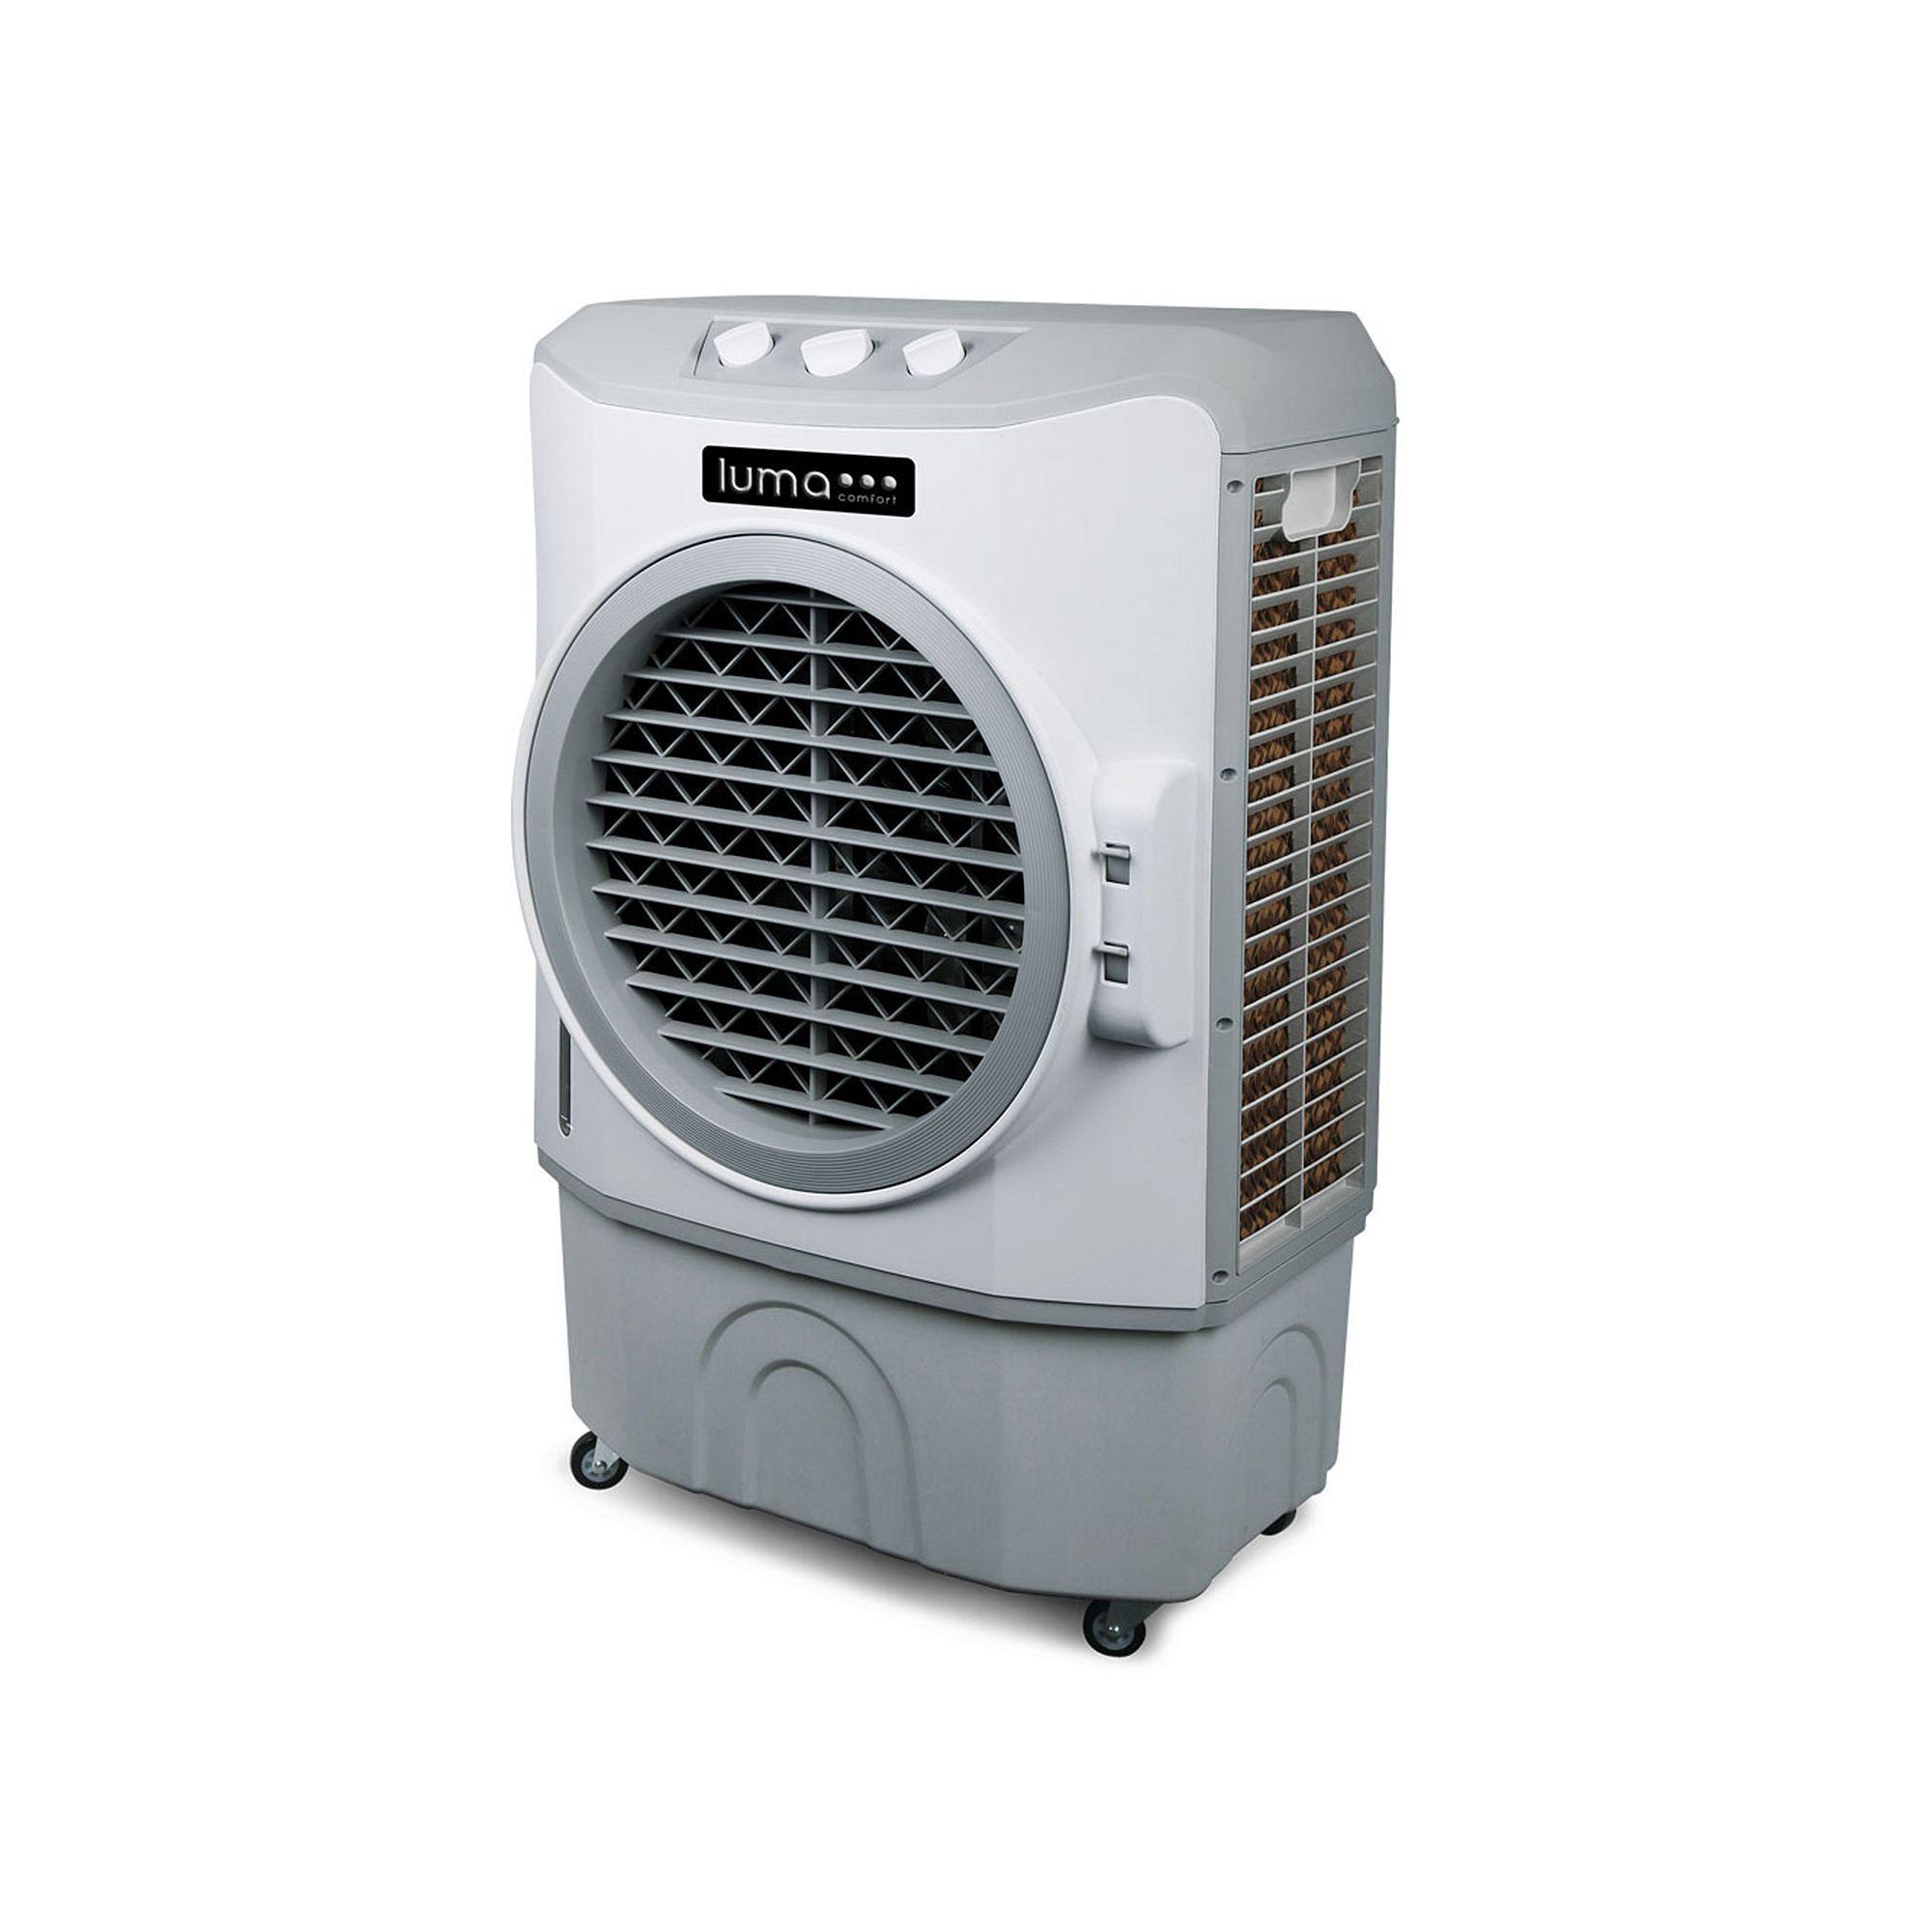 Luma Comfort High Power Evaporative Cooler Evaporative